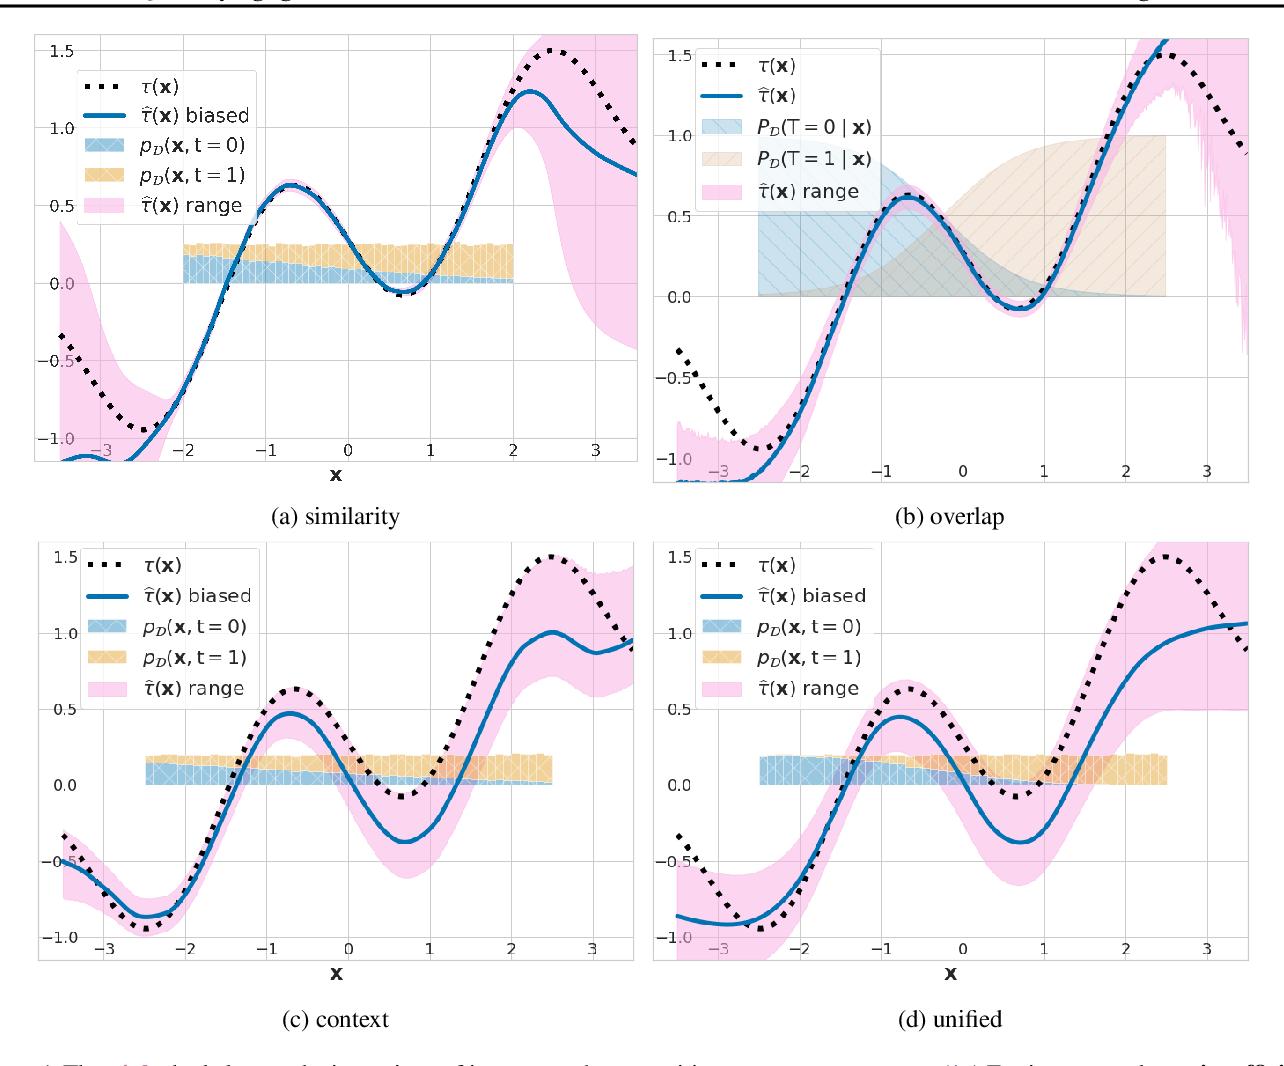 Figure 1 for Quantifying Ignorance in Individual-Level Causal-Effect Estimates under Hidden Confounding